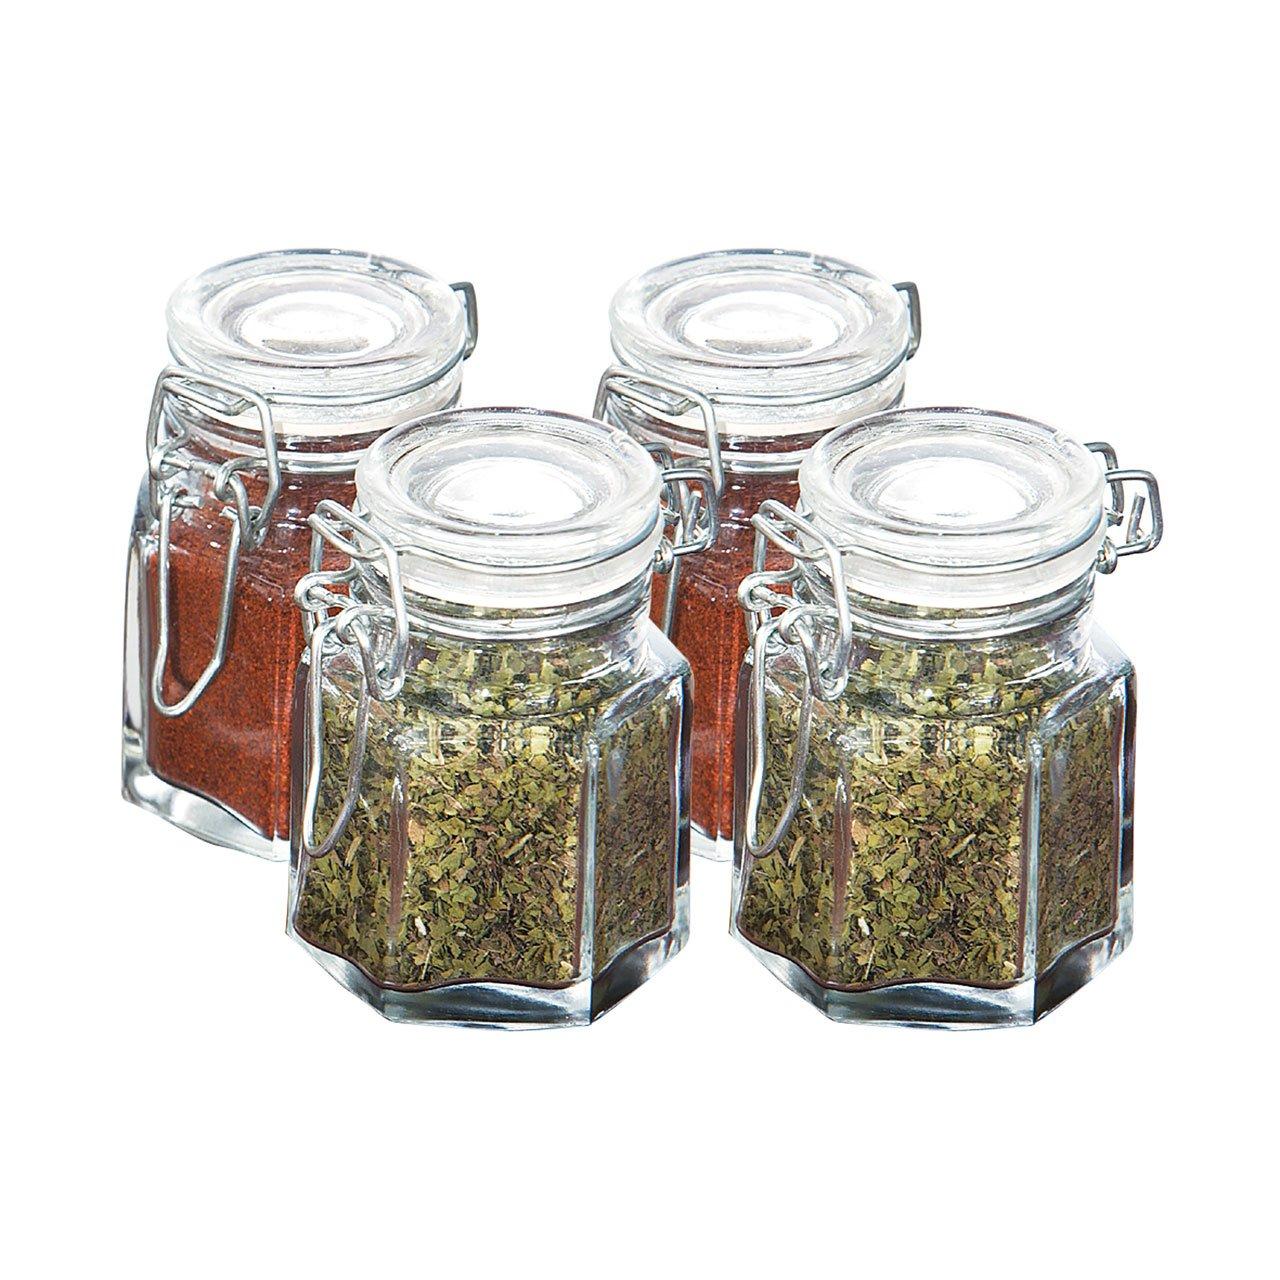 set of 24 glass clip top vintage spice storage jars amazon co uk